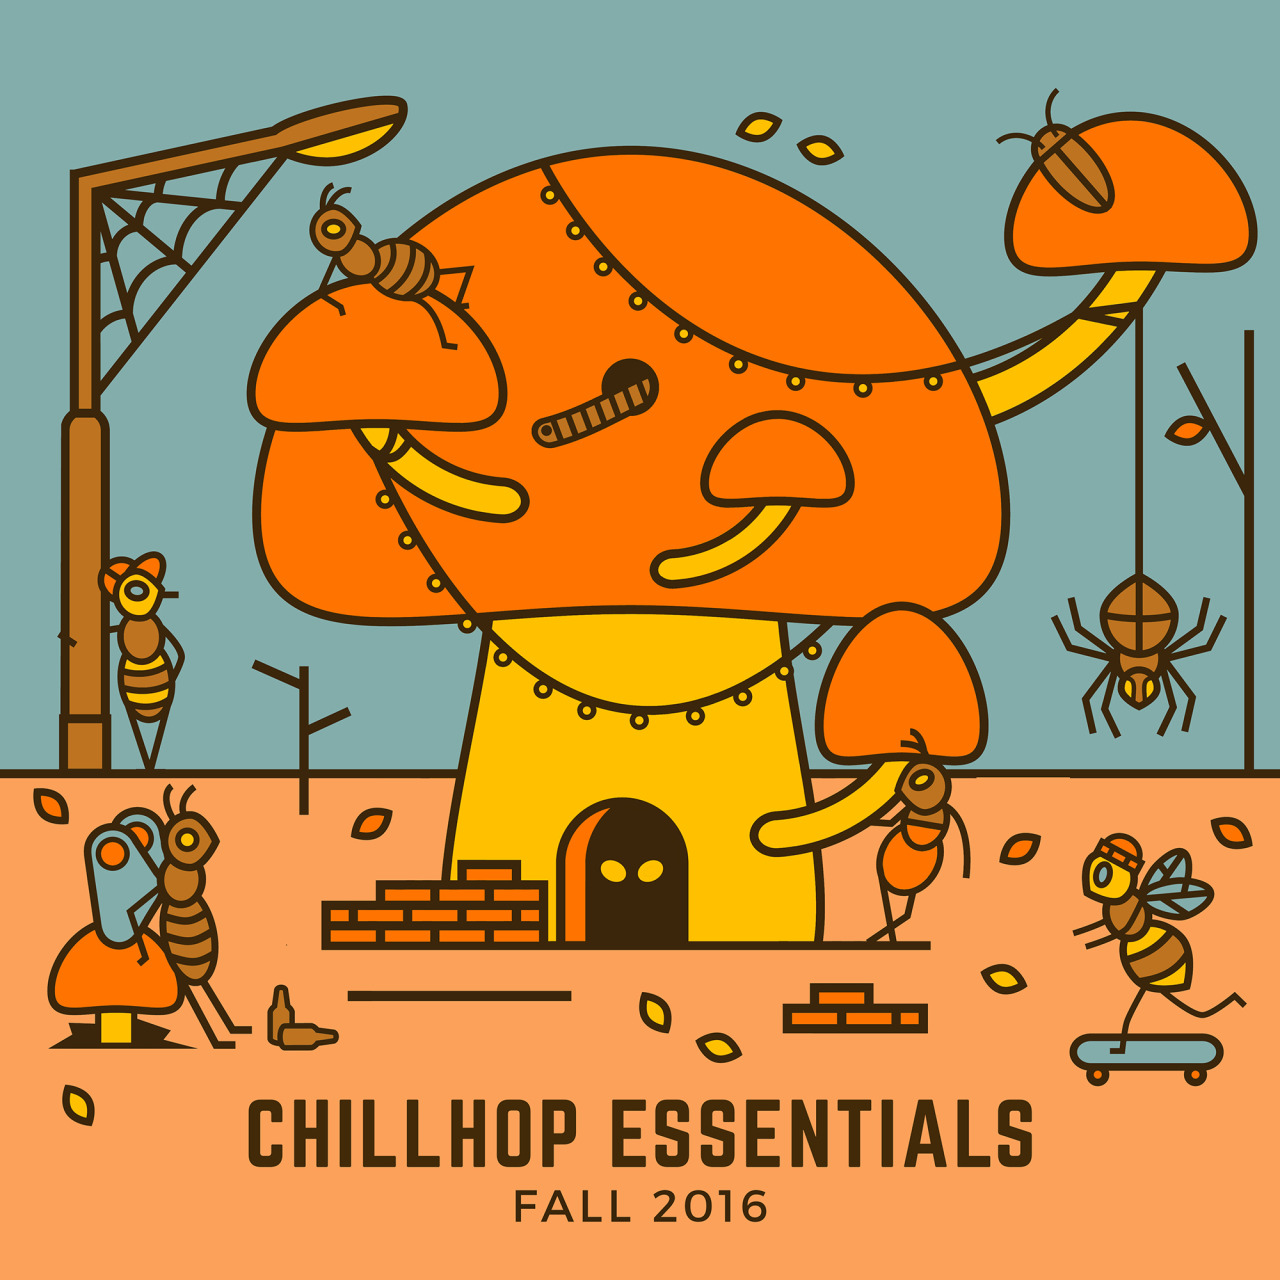 Japanese chillhop